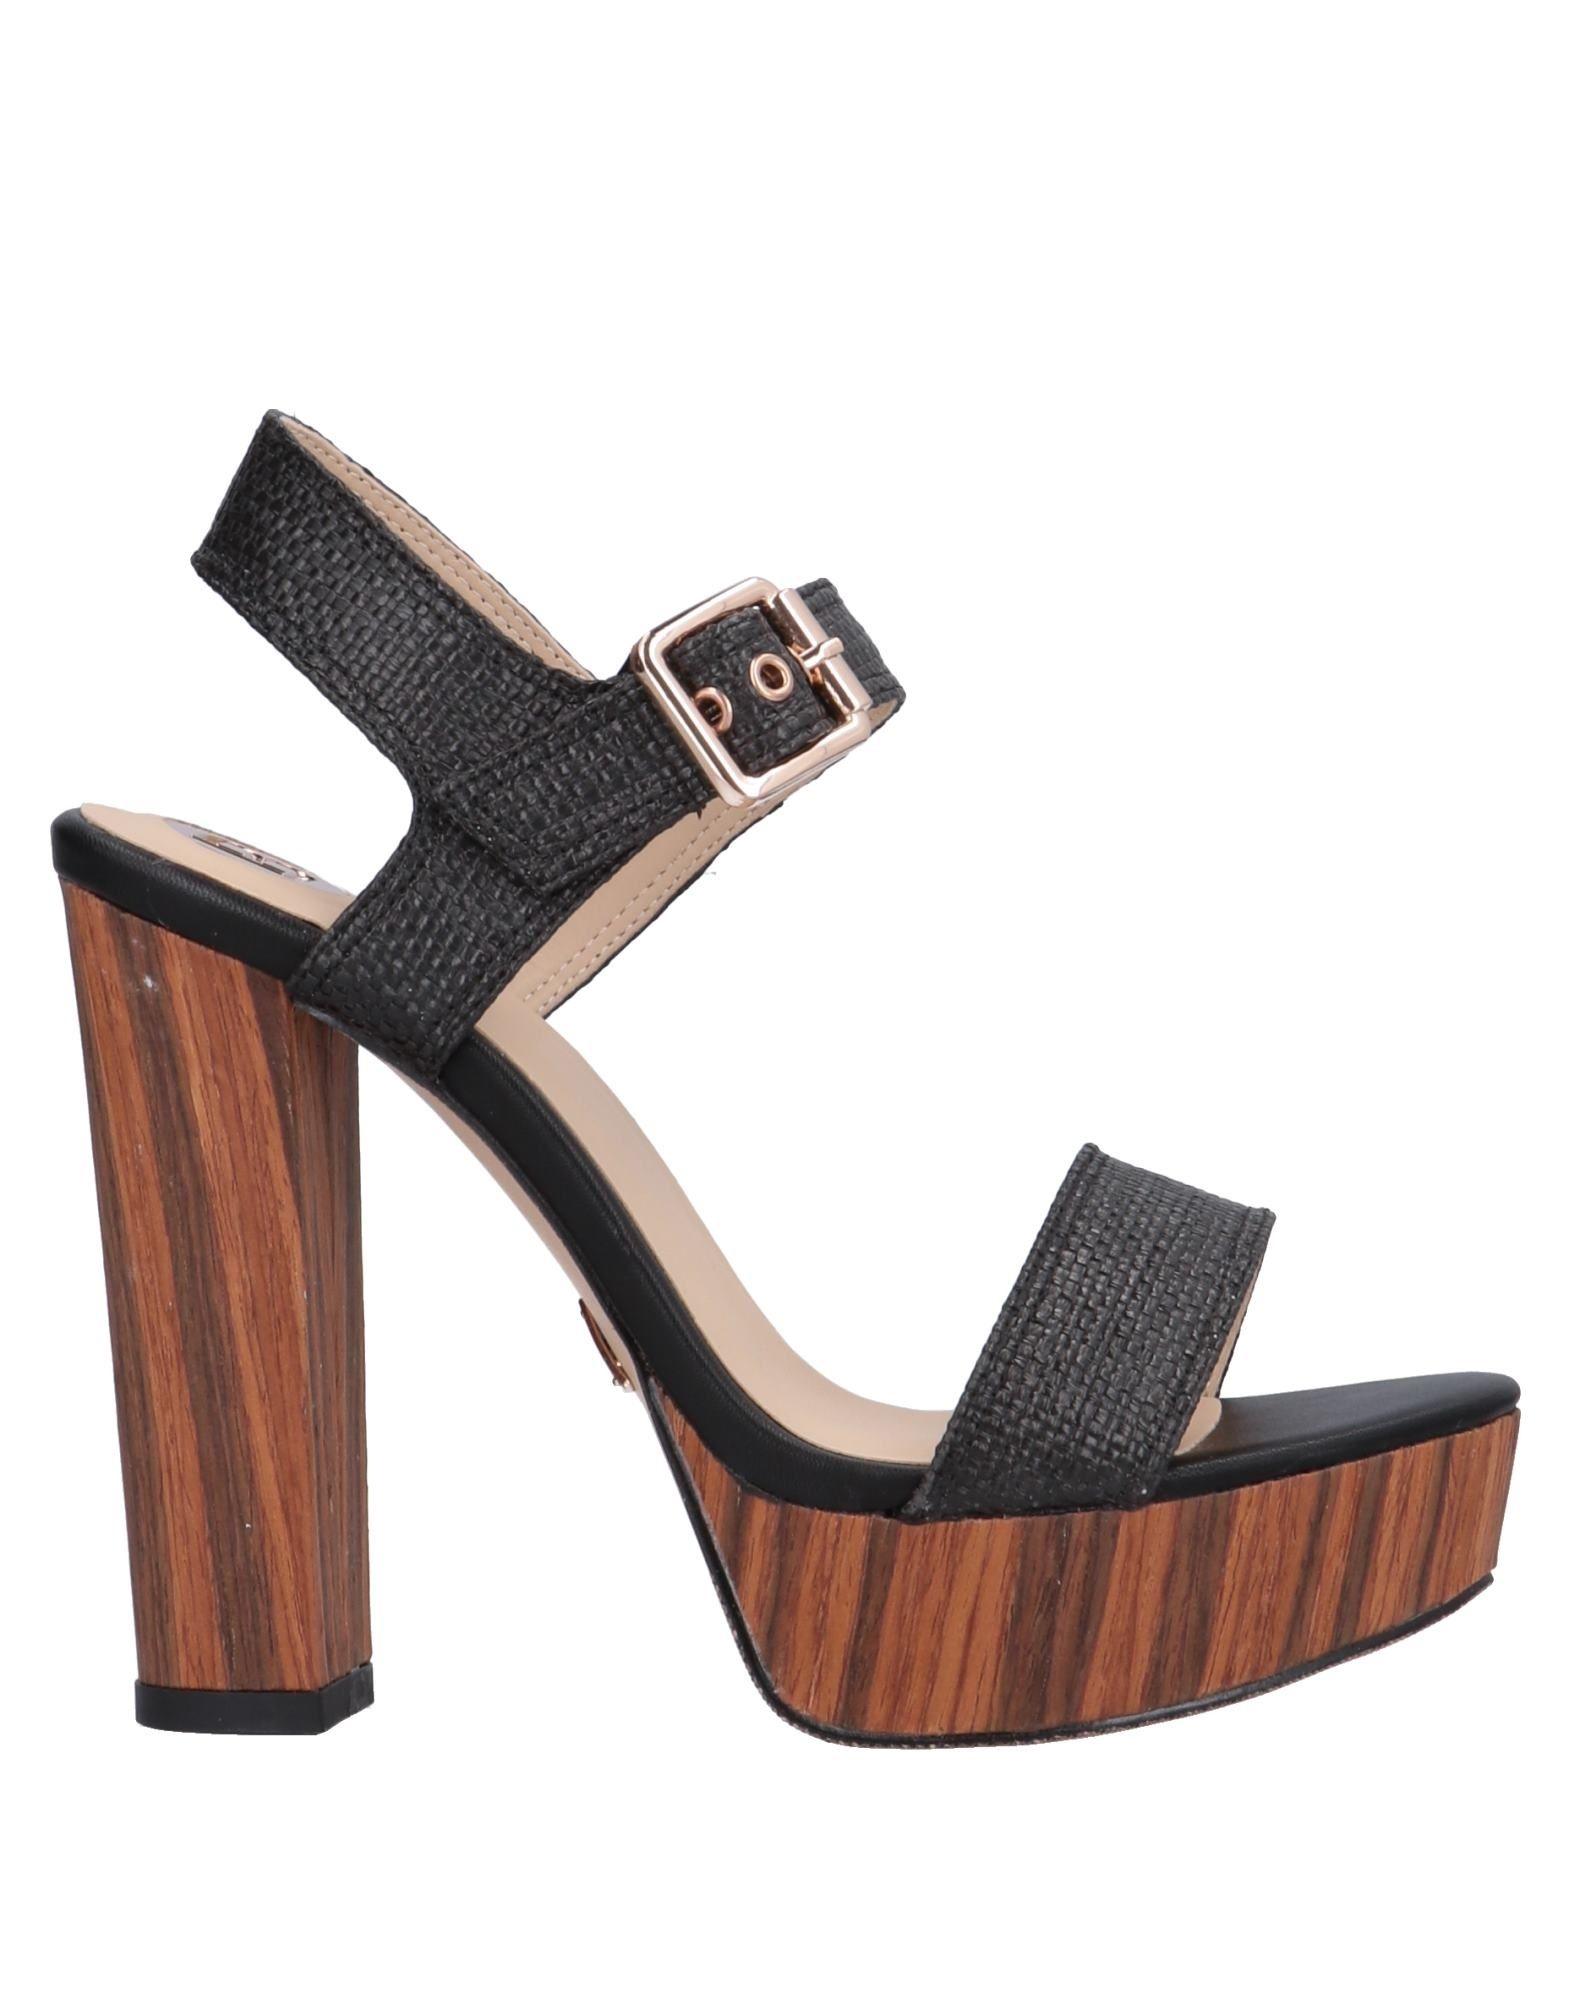 Laura Biagiotti Sandals - Women Sandals Laura Biagiotti Sandals Women online on  Canada - 11565457ST 658f93